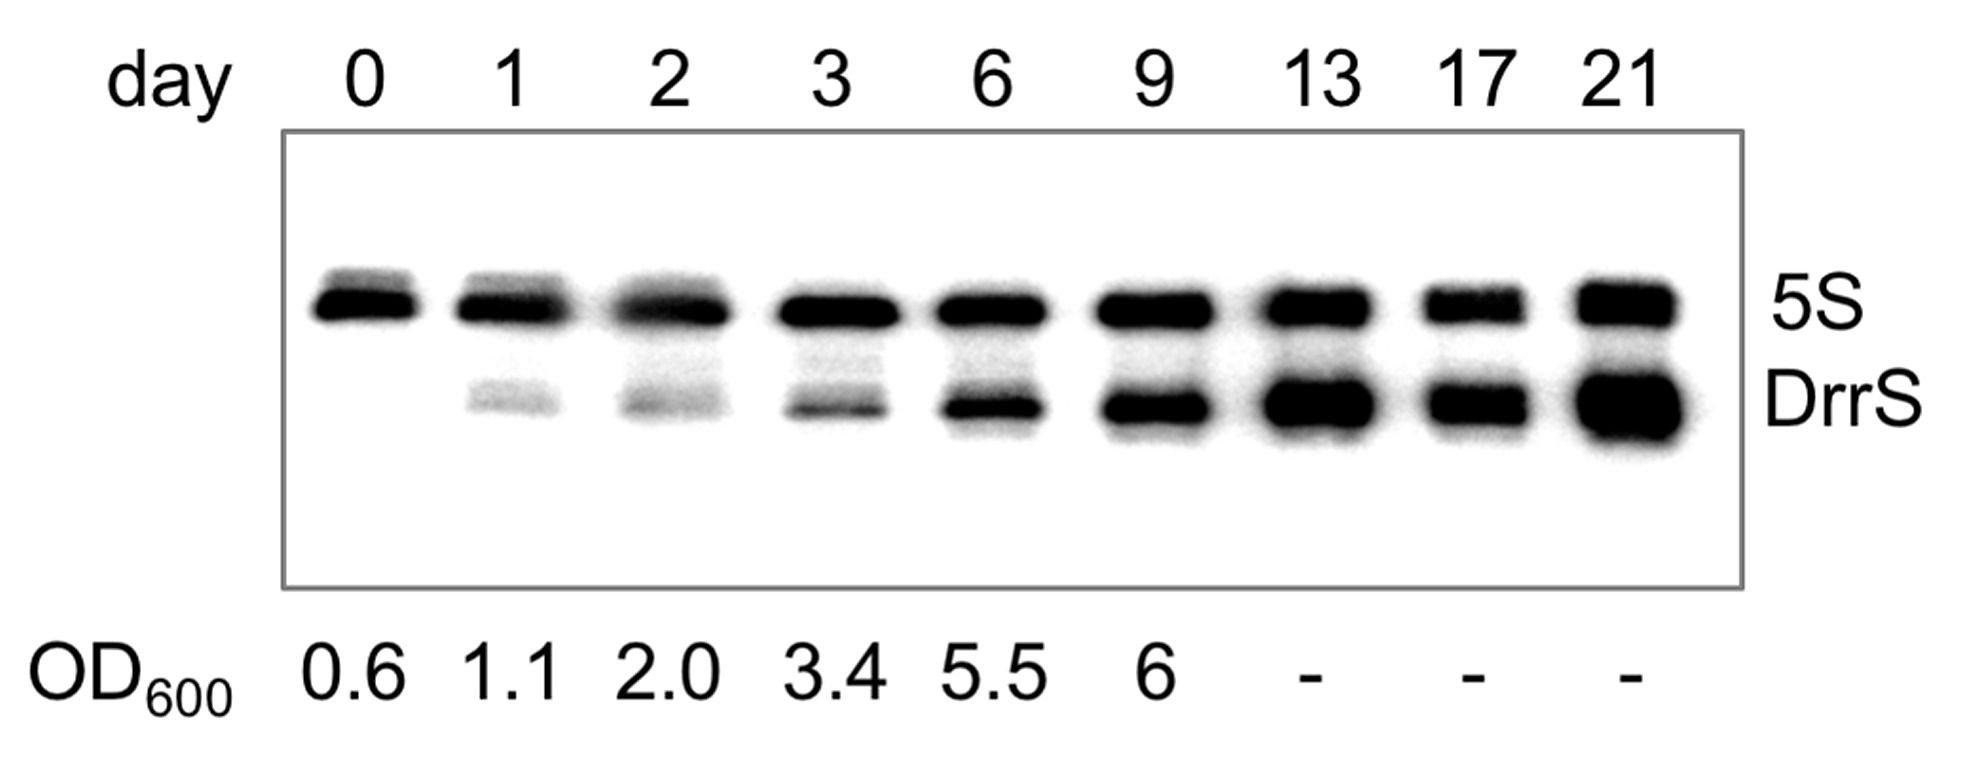 Section 9 2 Review Genetic Crosses Worksheet Answers  Briefencounters Also Section 9 2 Review Genetic Crosses Worksheet Answers